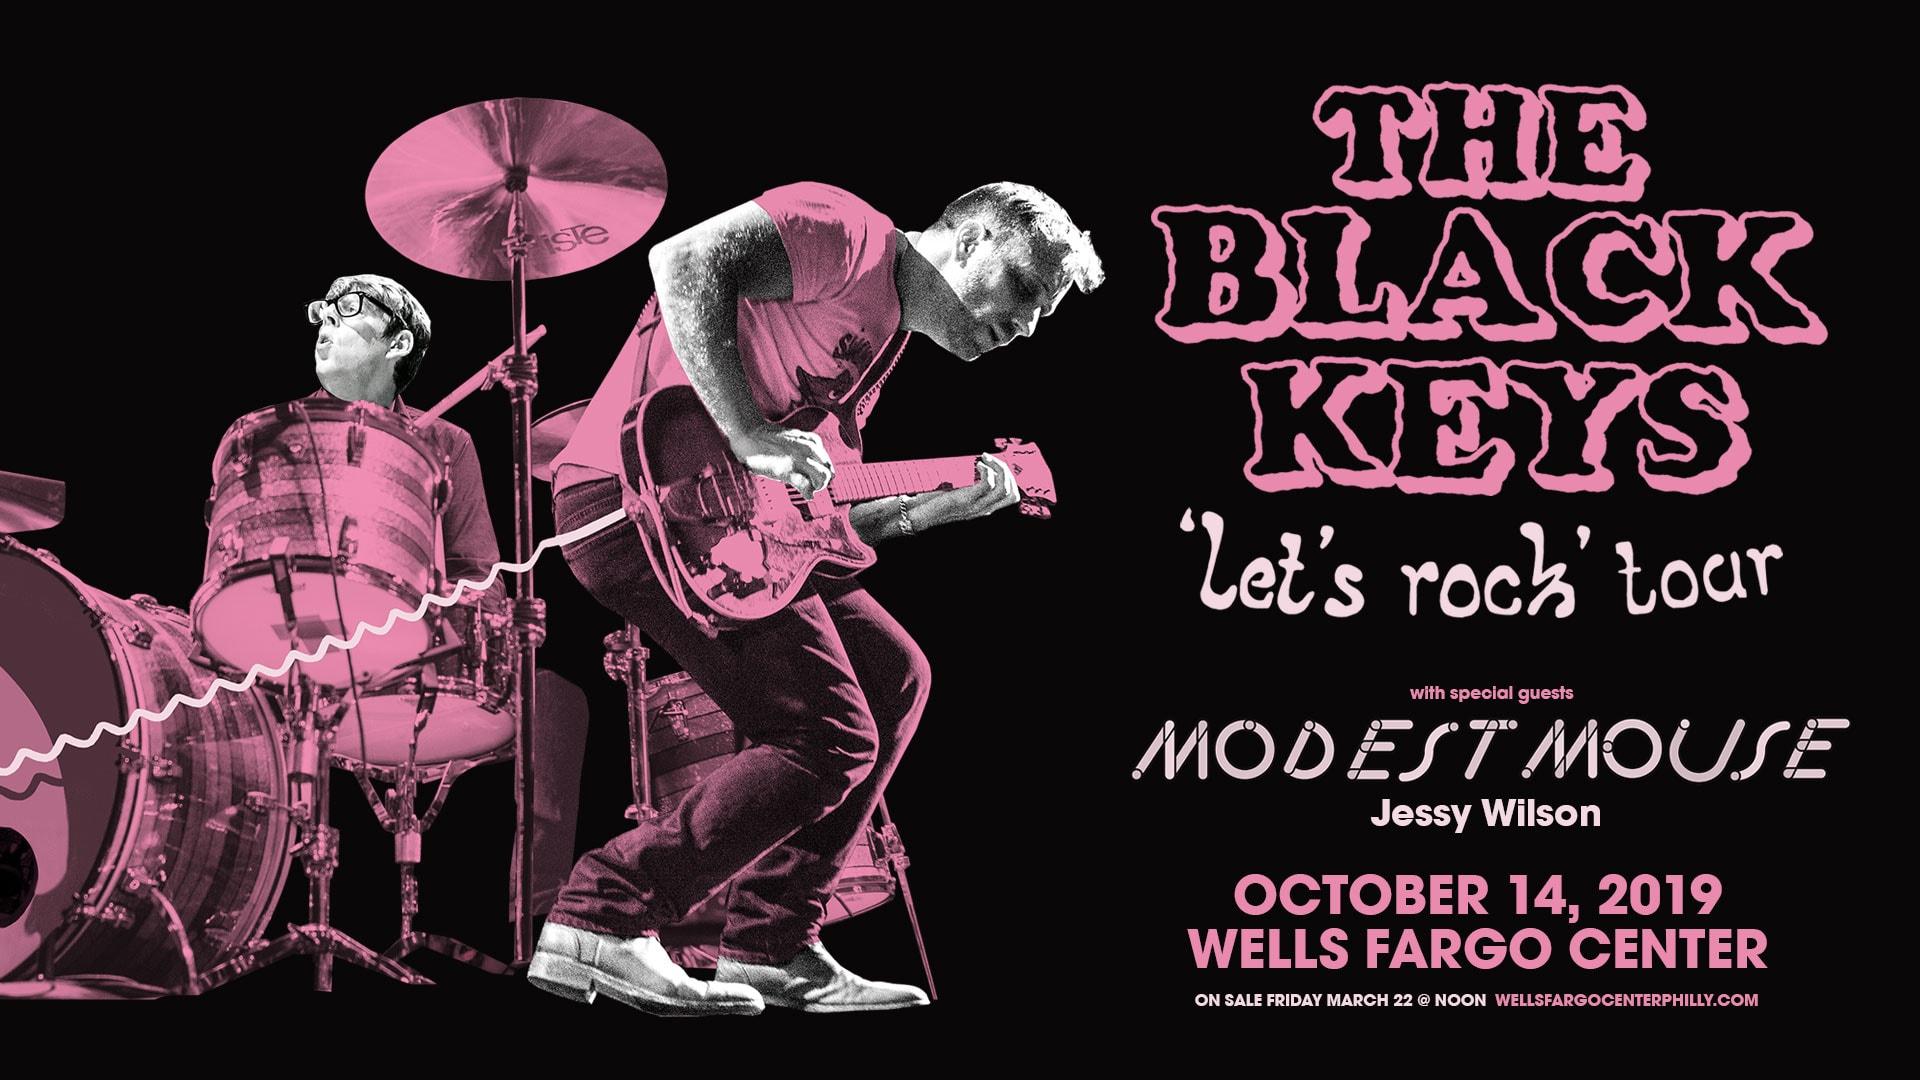 The Black Keys 2019